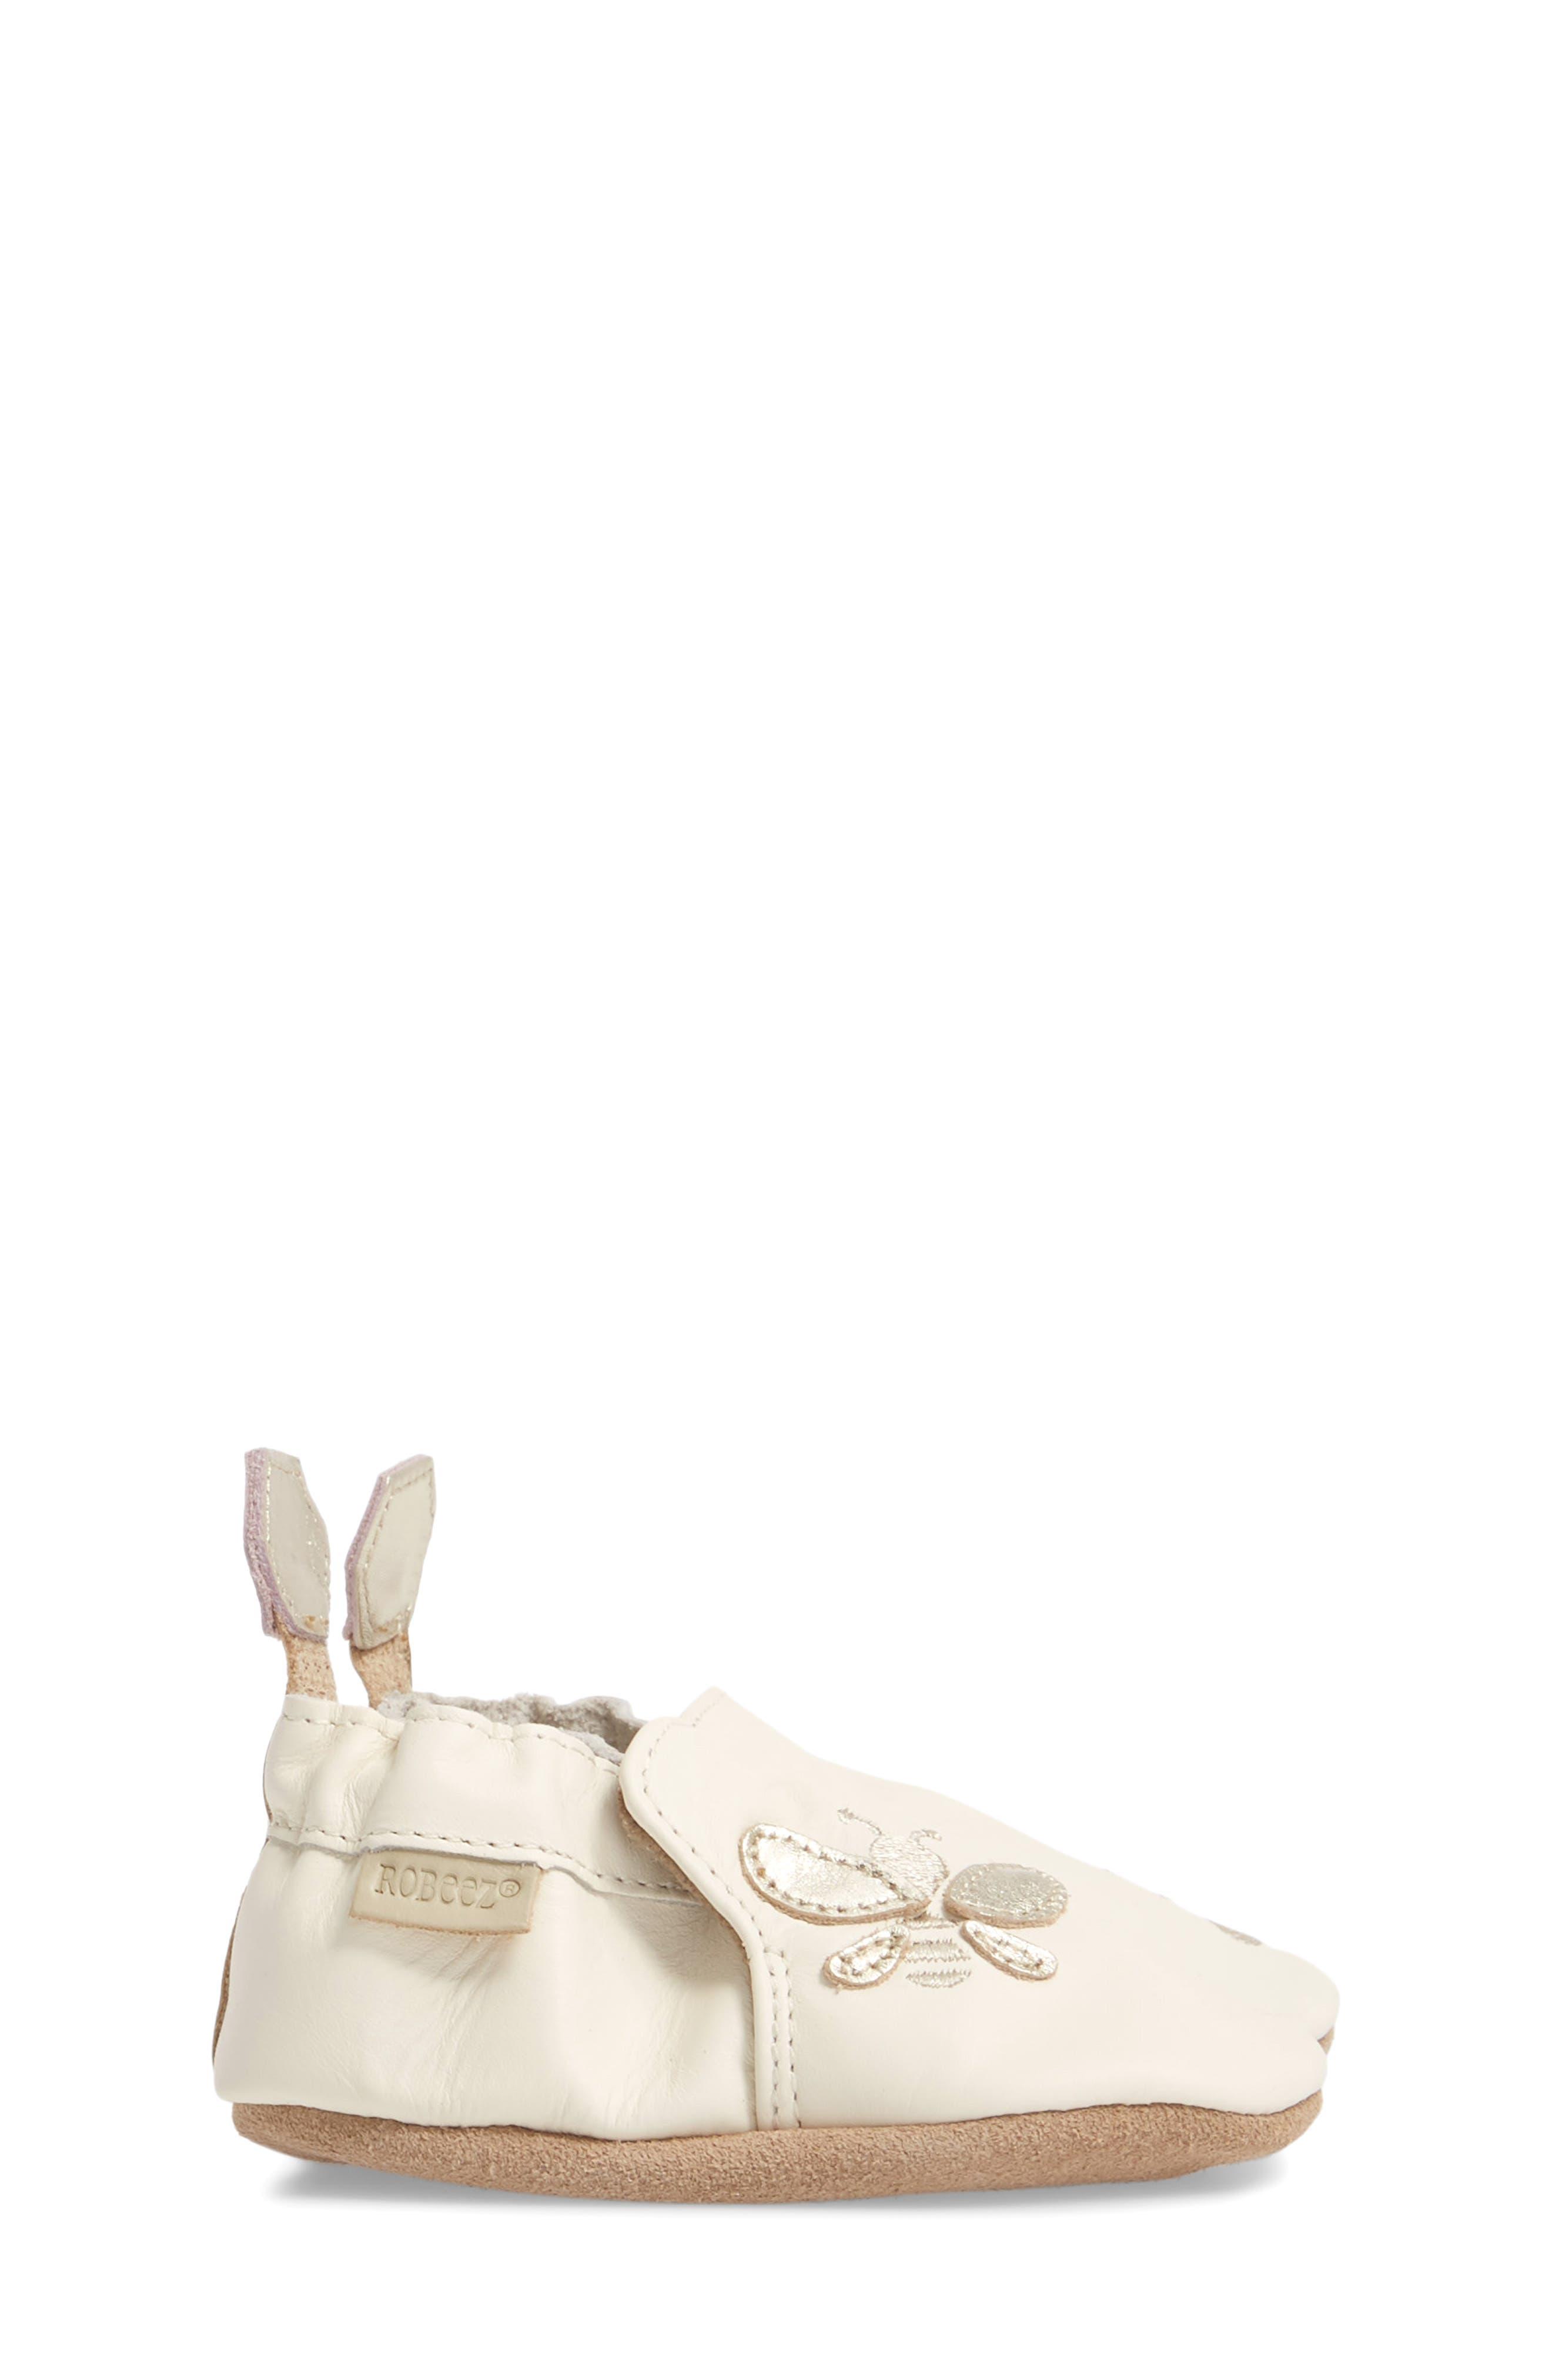 Bee Moccasin Sneaker,                             Alternate thumbnail 4, color,                             Cream